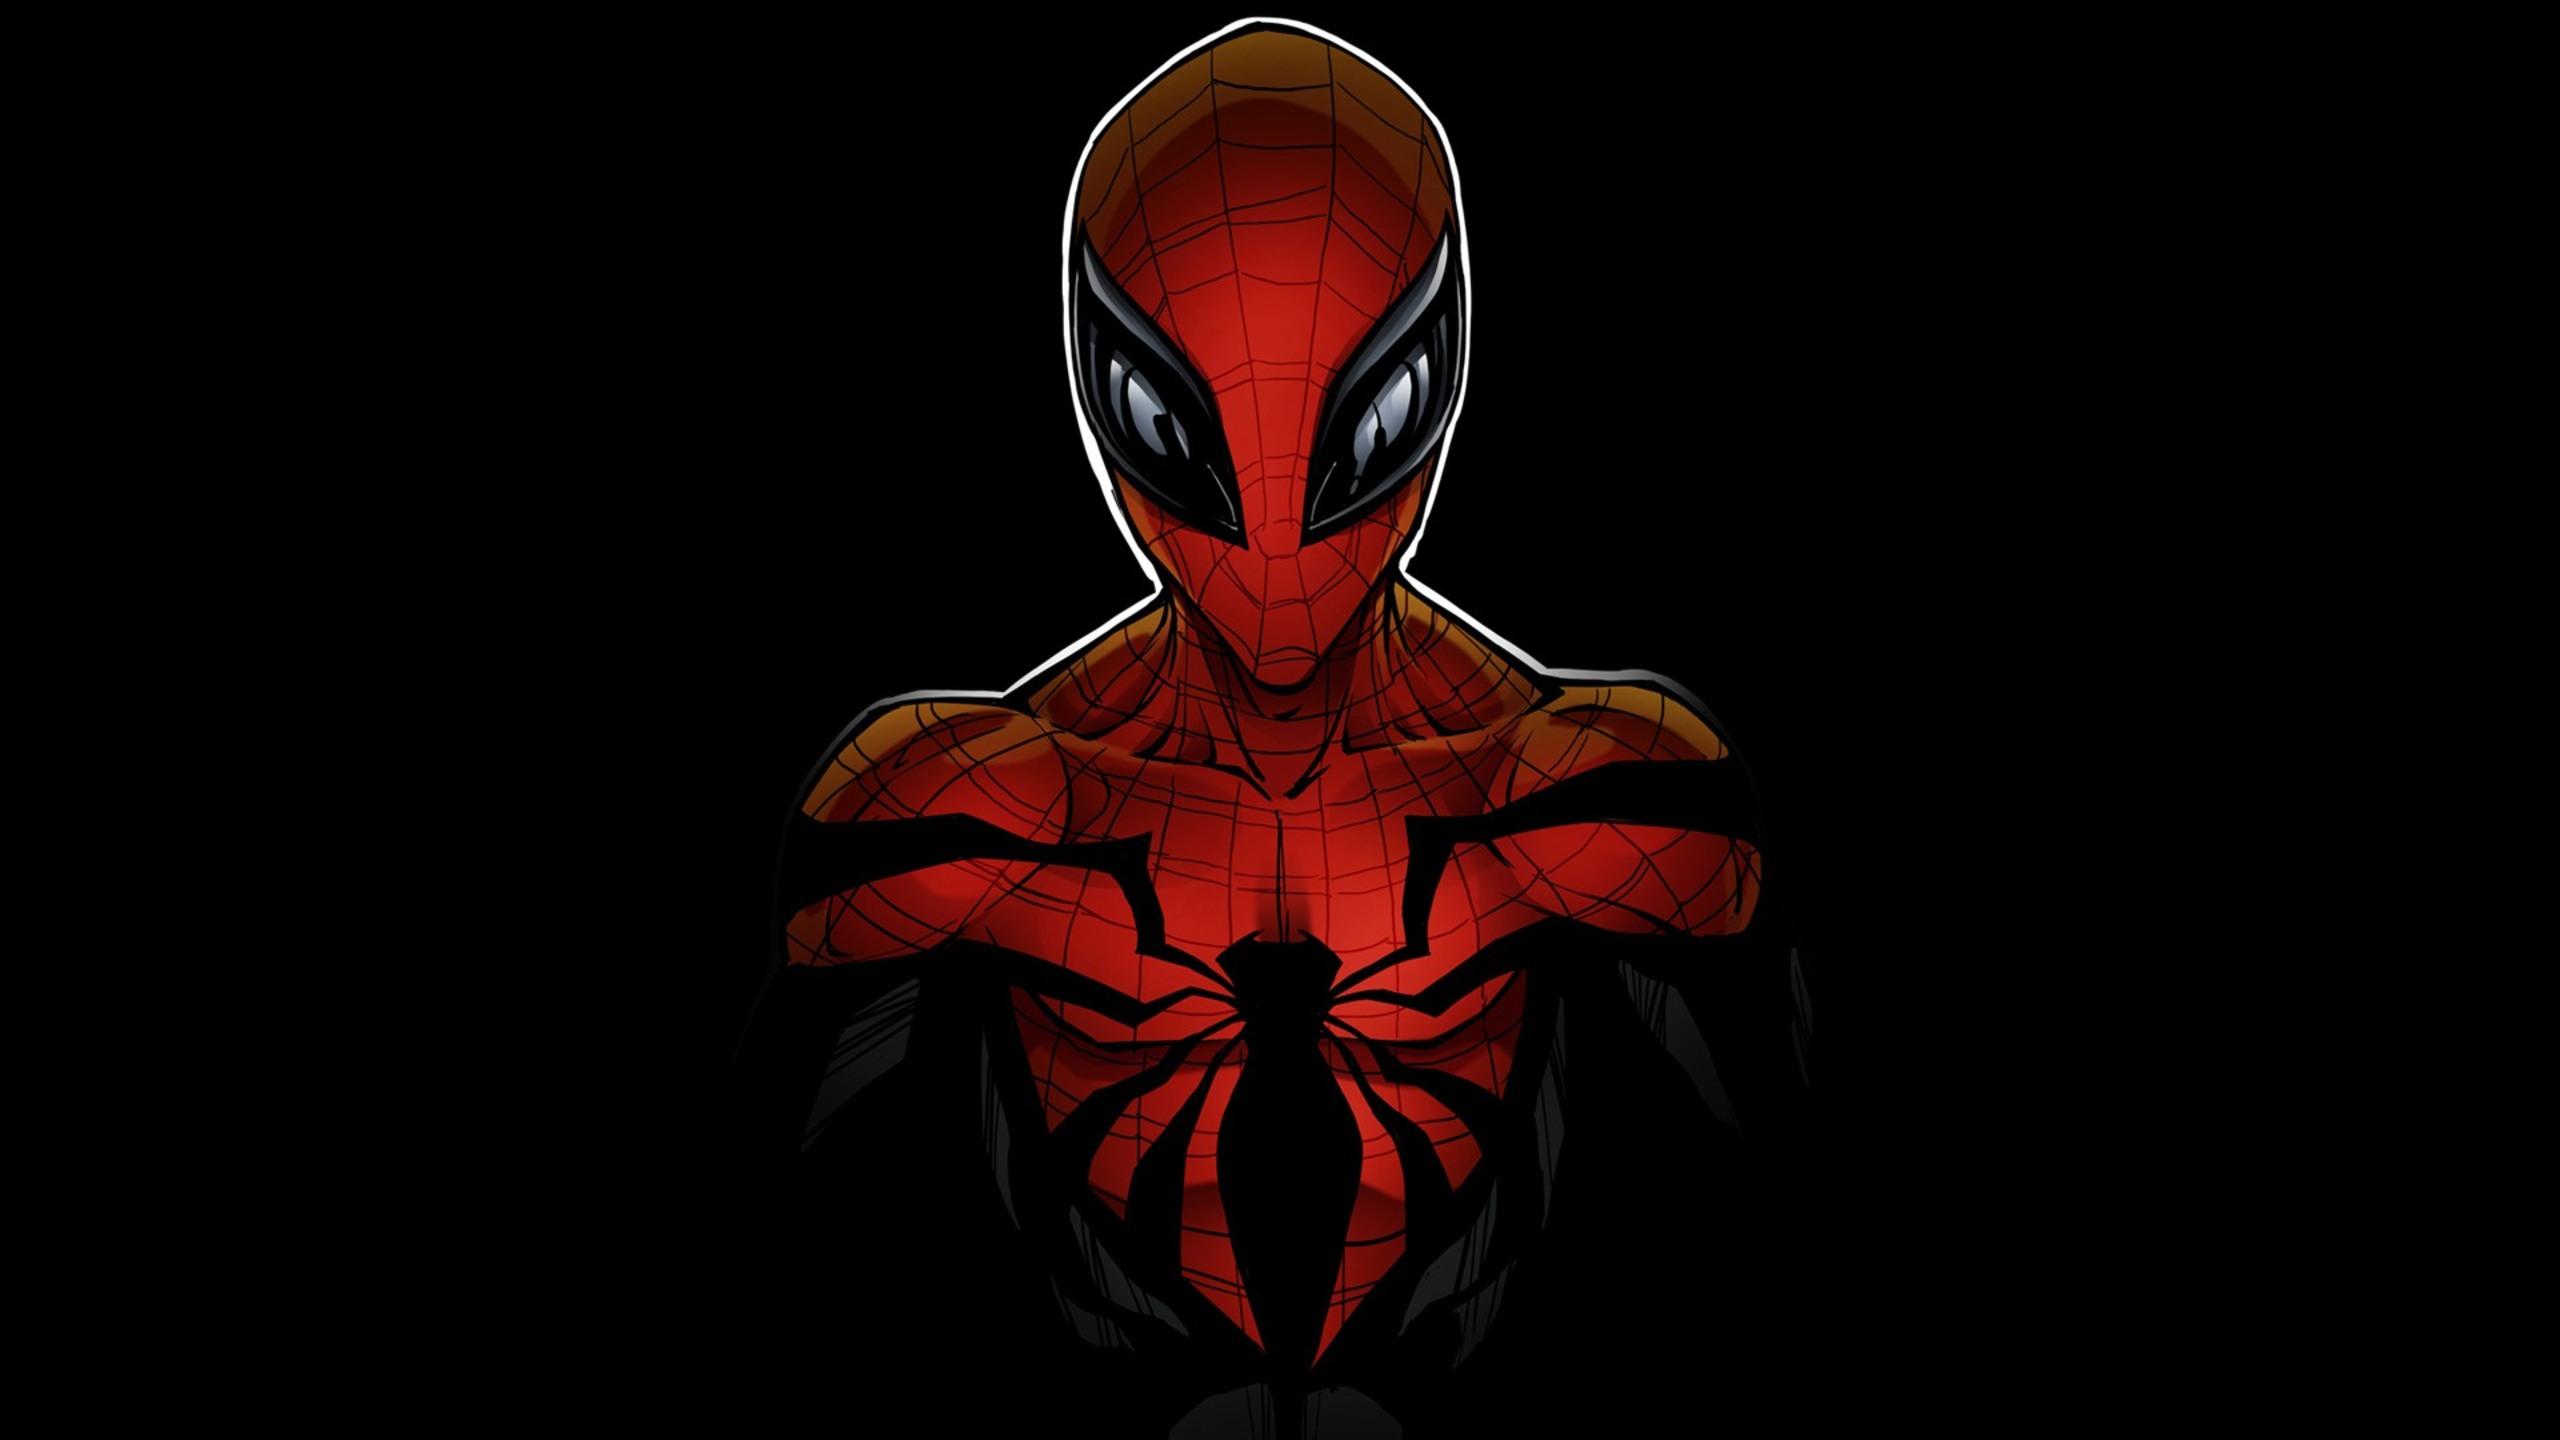 2560x1440 Spiderman Comicbook 1440P Resolution HD 4k ...